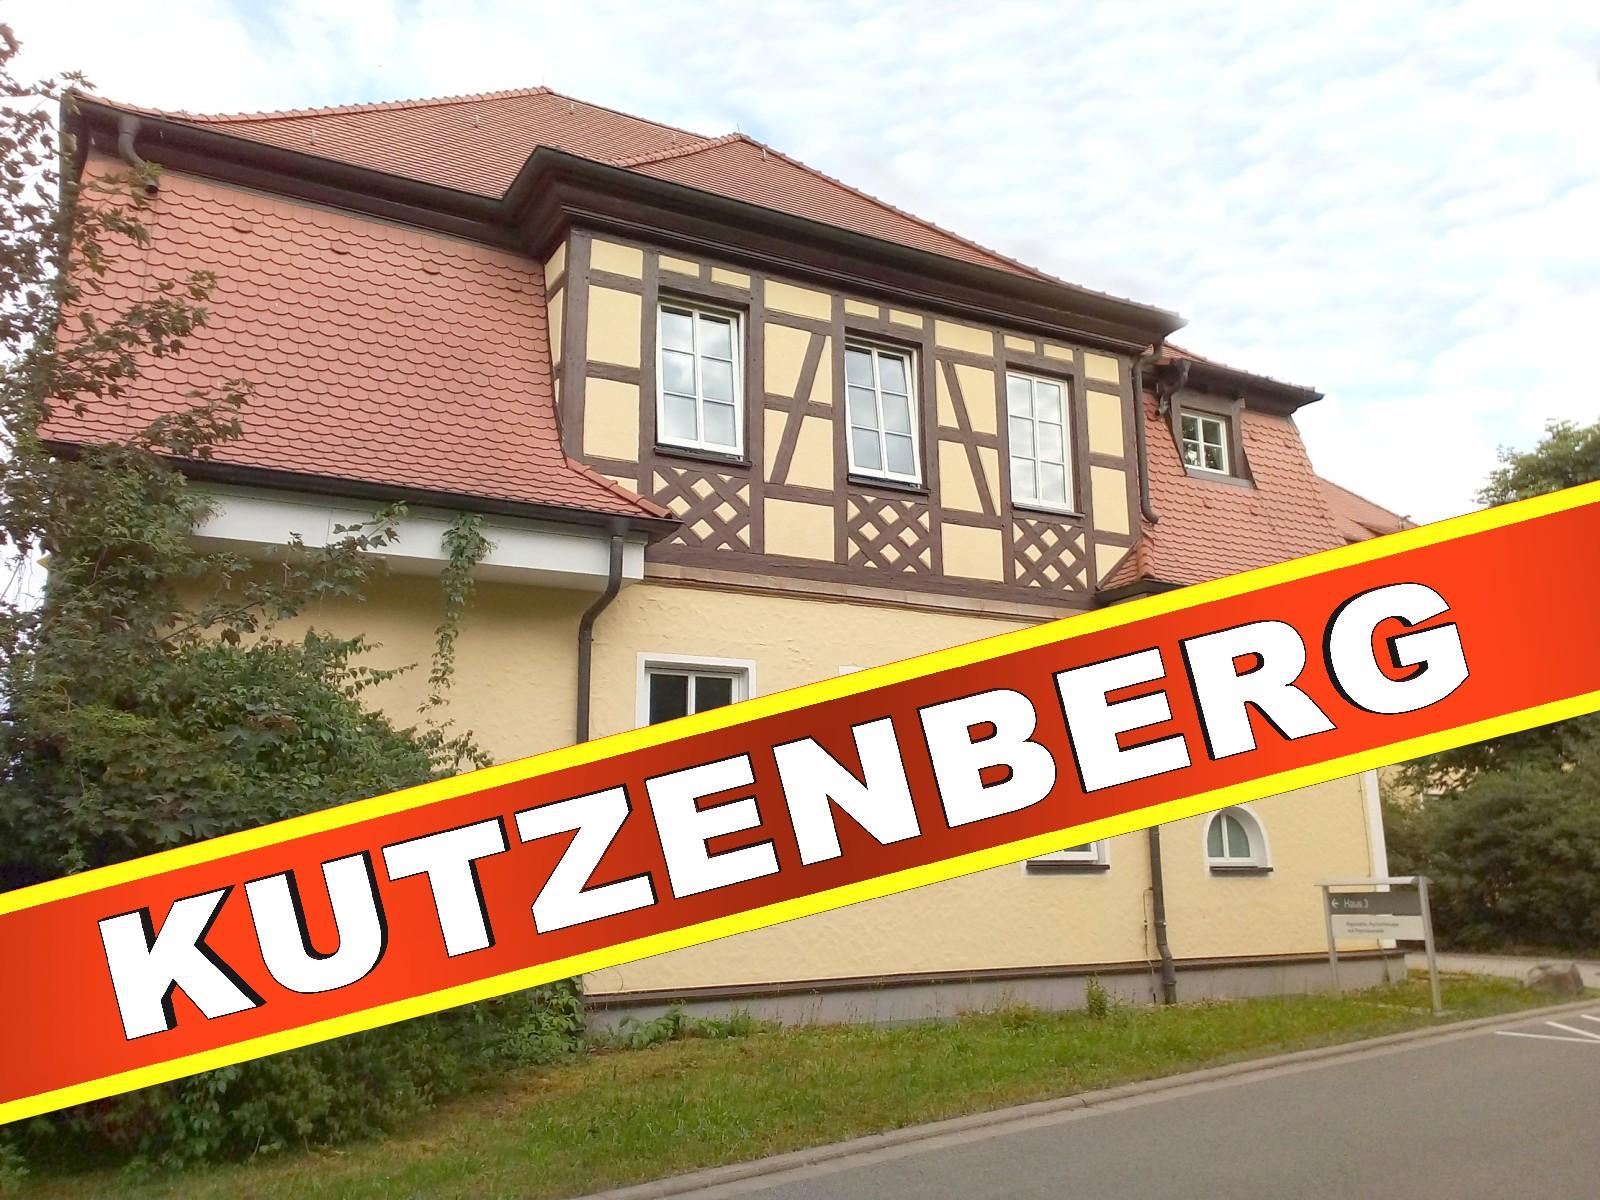 Ergotherapie Kutzenberg